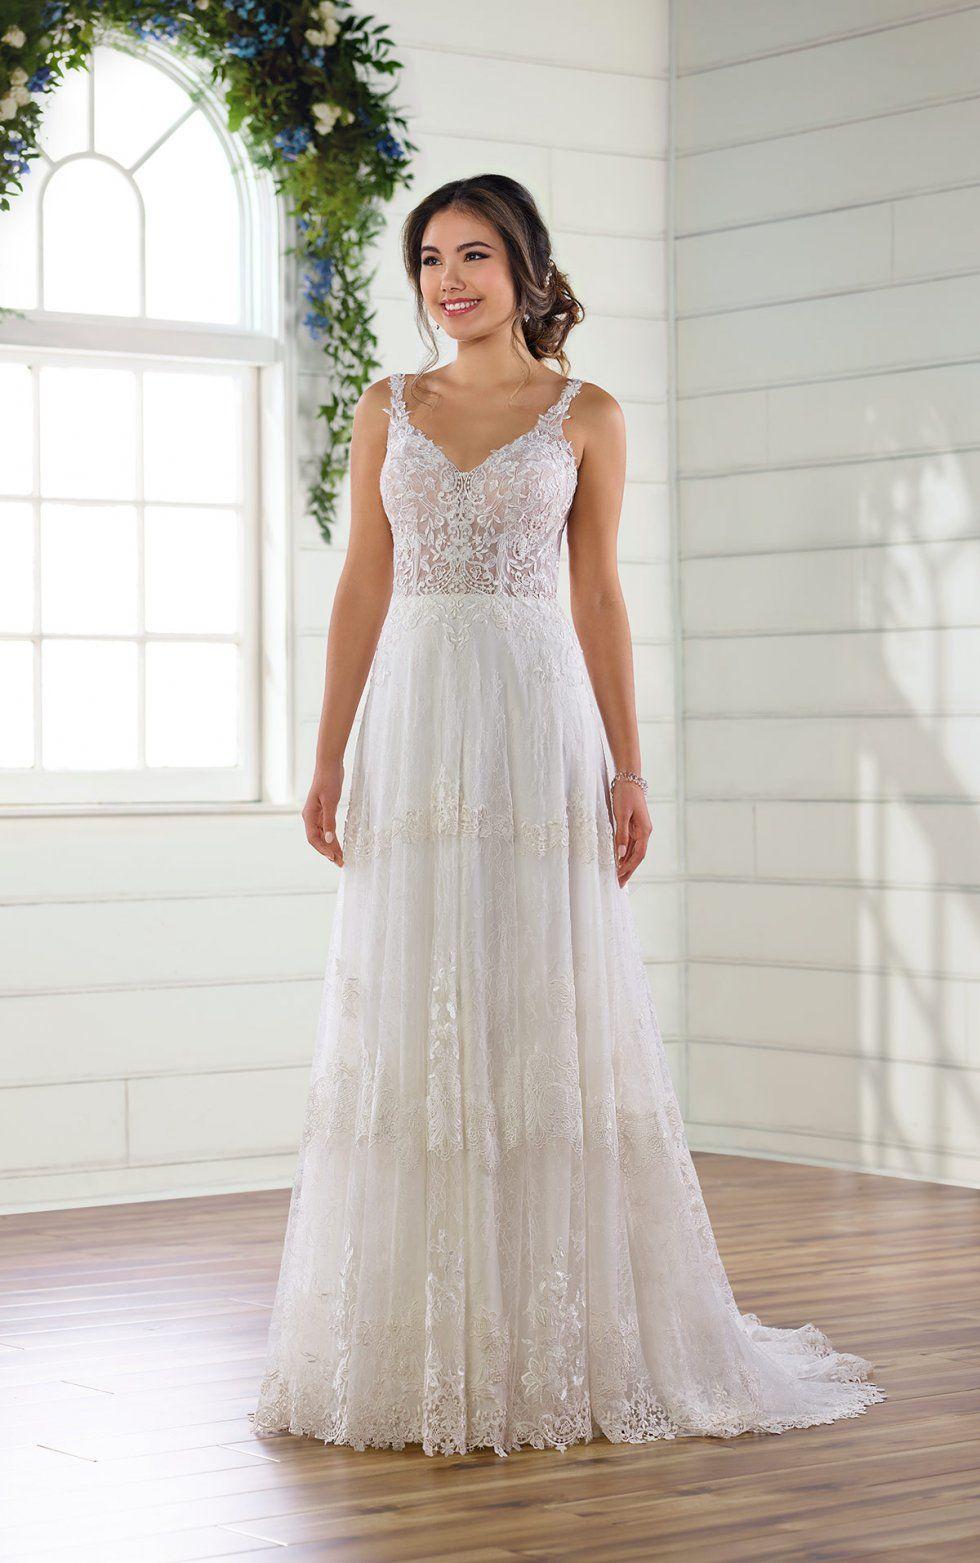 Simple Boho Chiffon Wedding Dress in 2020 Essense of